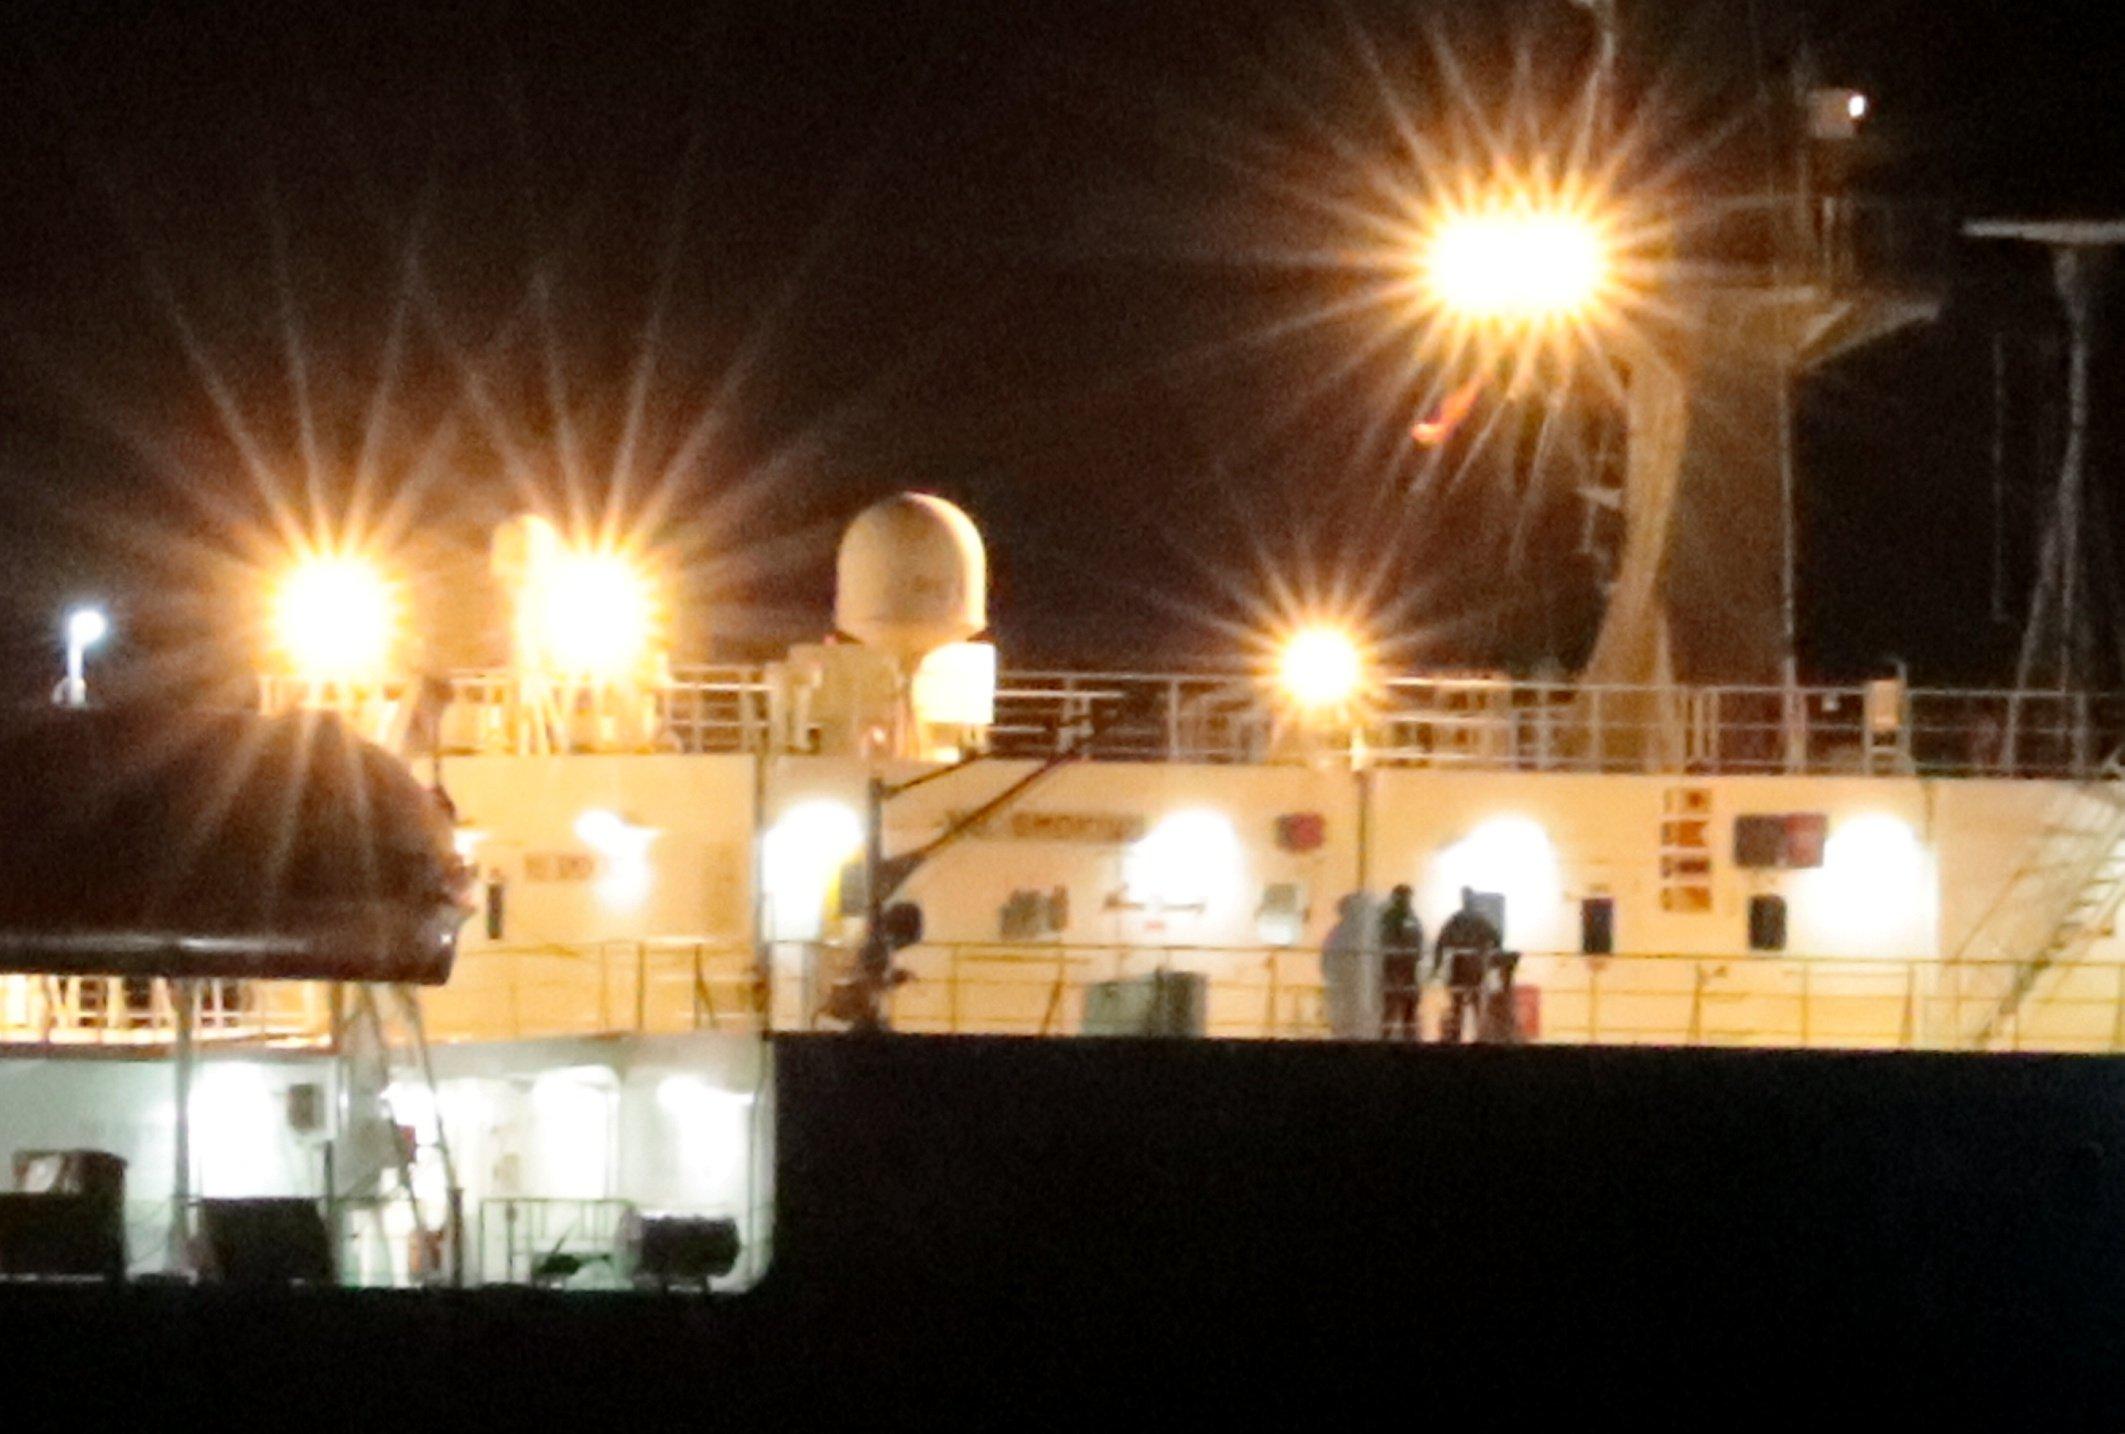 Grande Tema SBS in control off Essex coast this morning. Pix (c) copyright 22.12.18 Scott Huntley 07973 208461 16 CM3 4RP